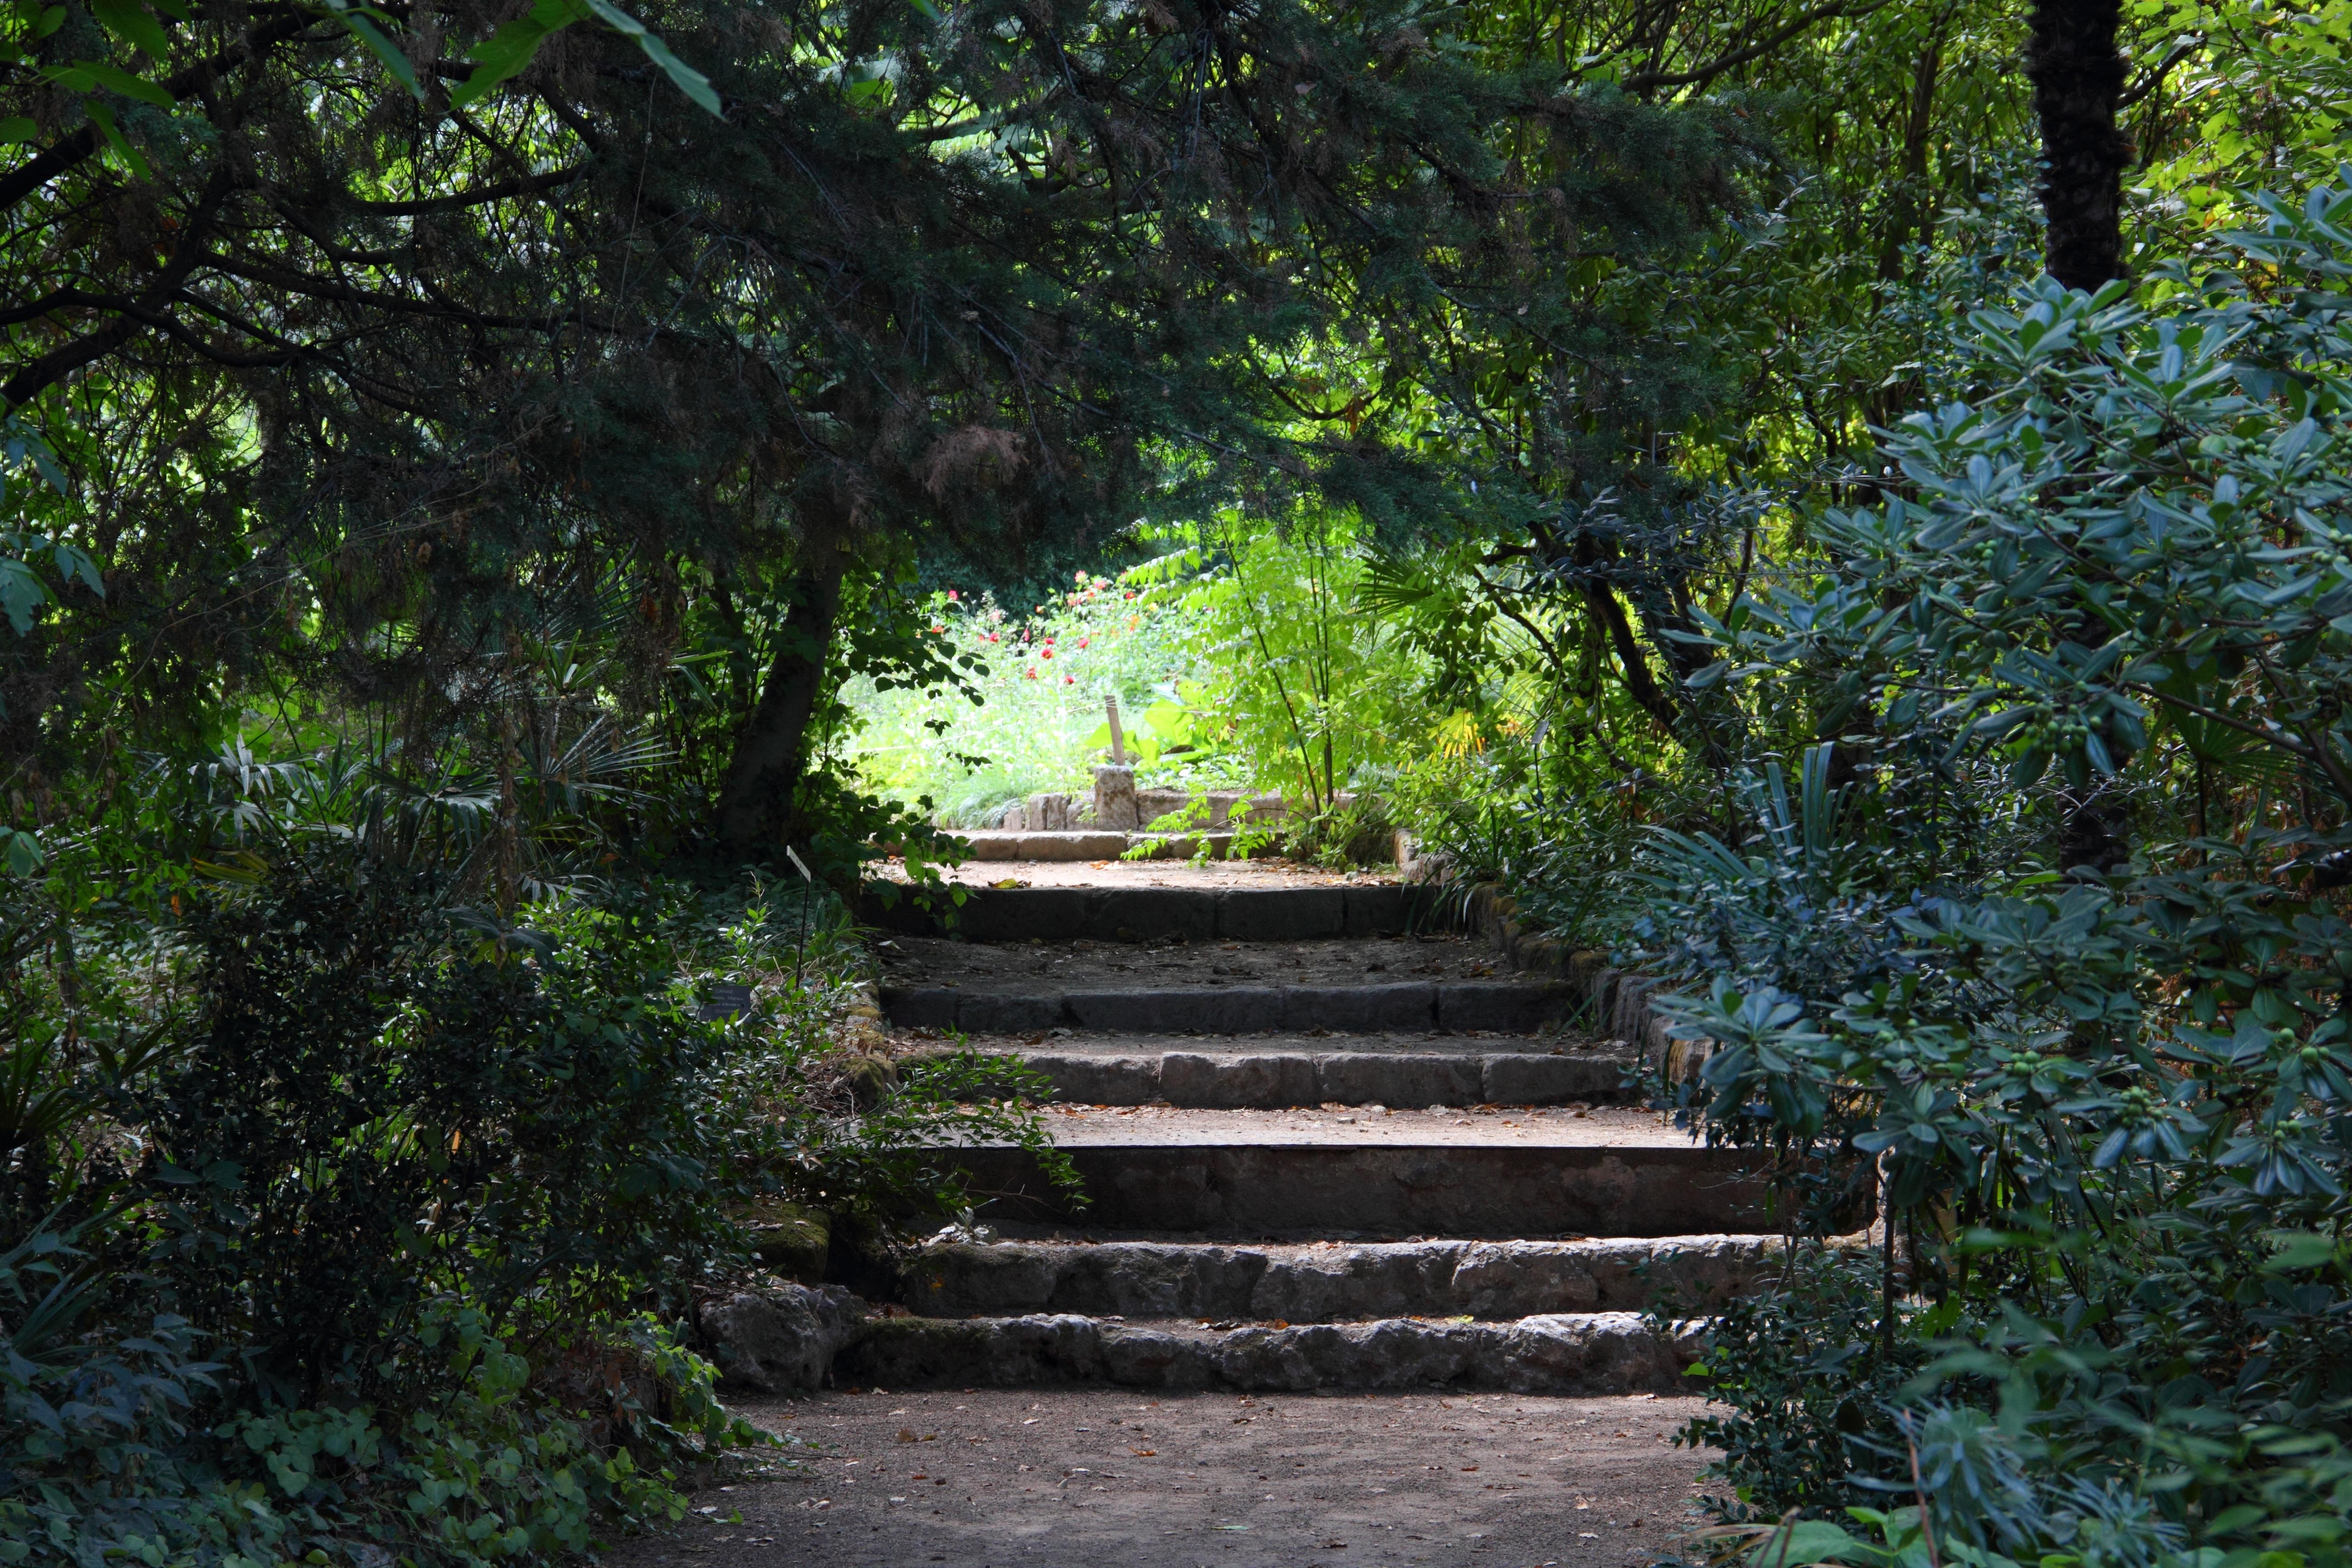 File Jardin des plantes Montpellier JPG Wikimedia mons